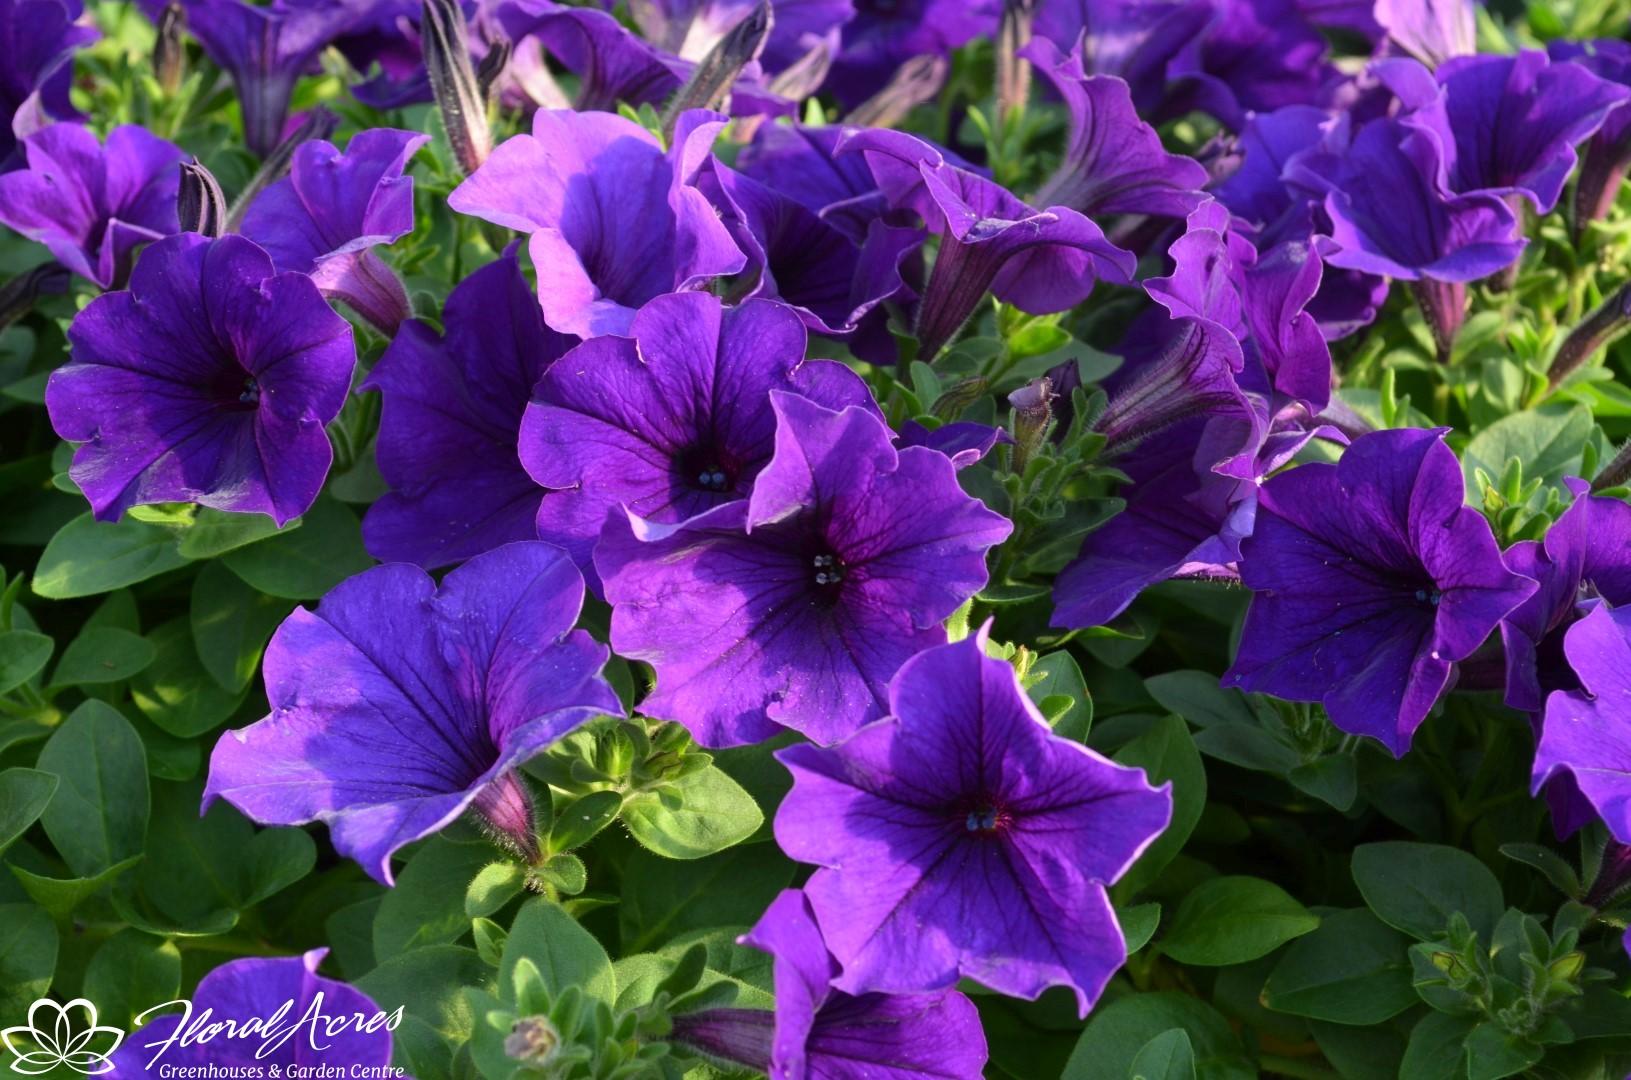 Petunia Easy Wave Blue Floral Acres